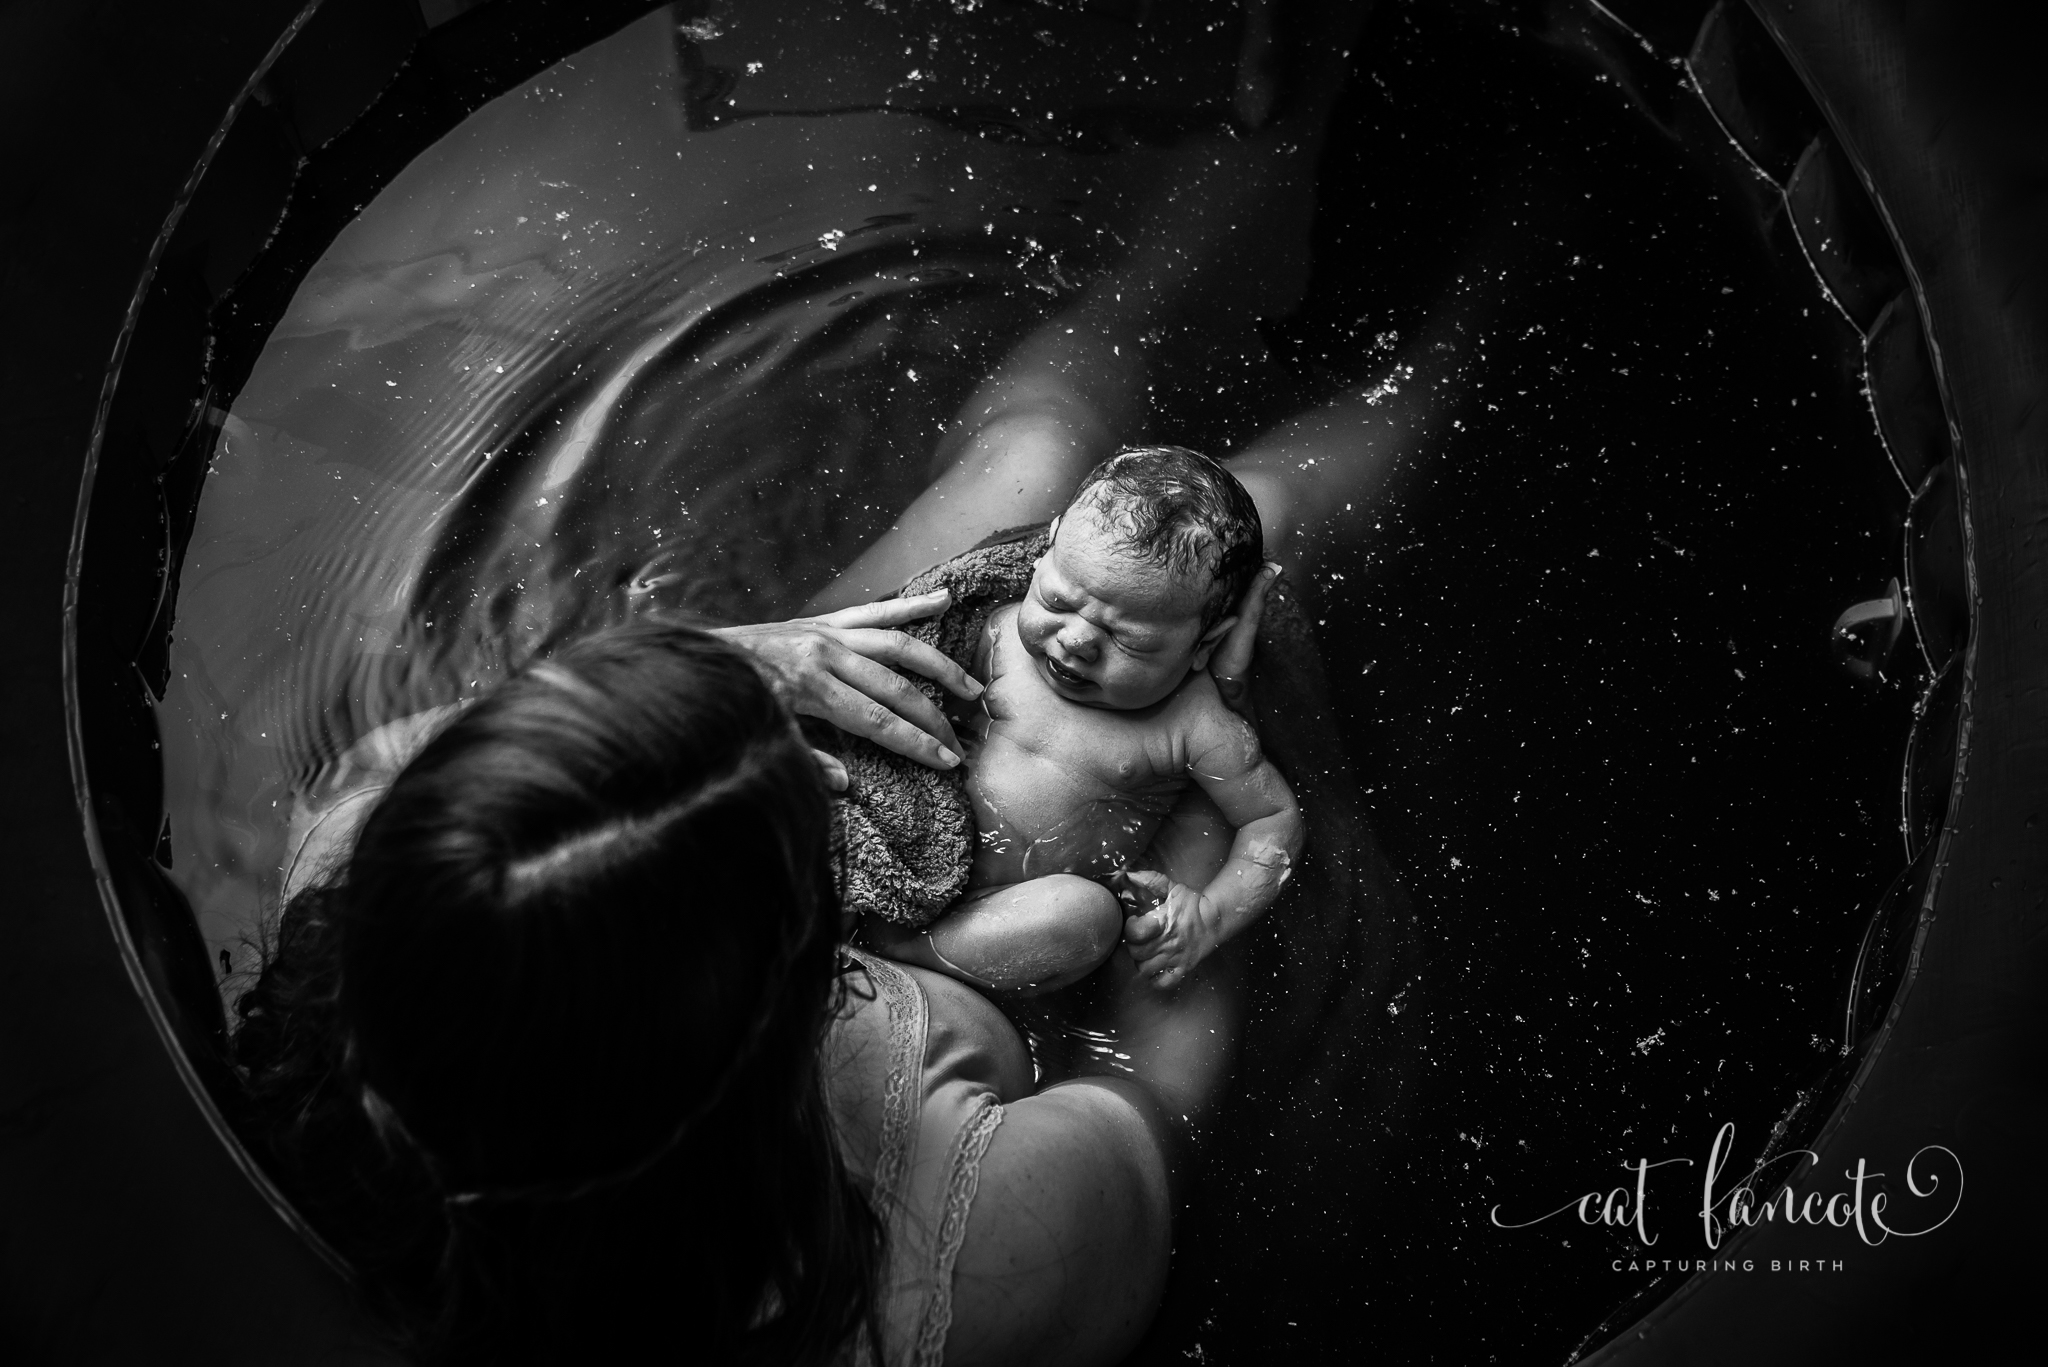 Galaxy-Baby_CatFancote_WM.jpg